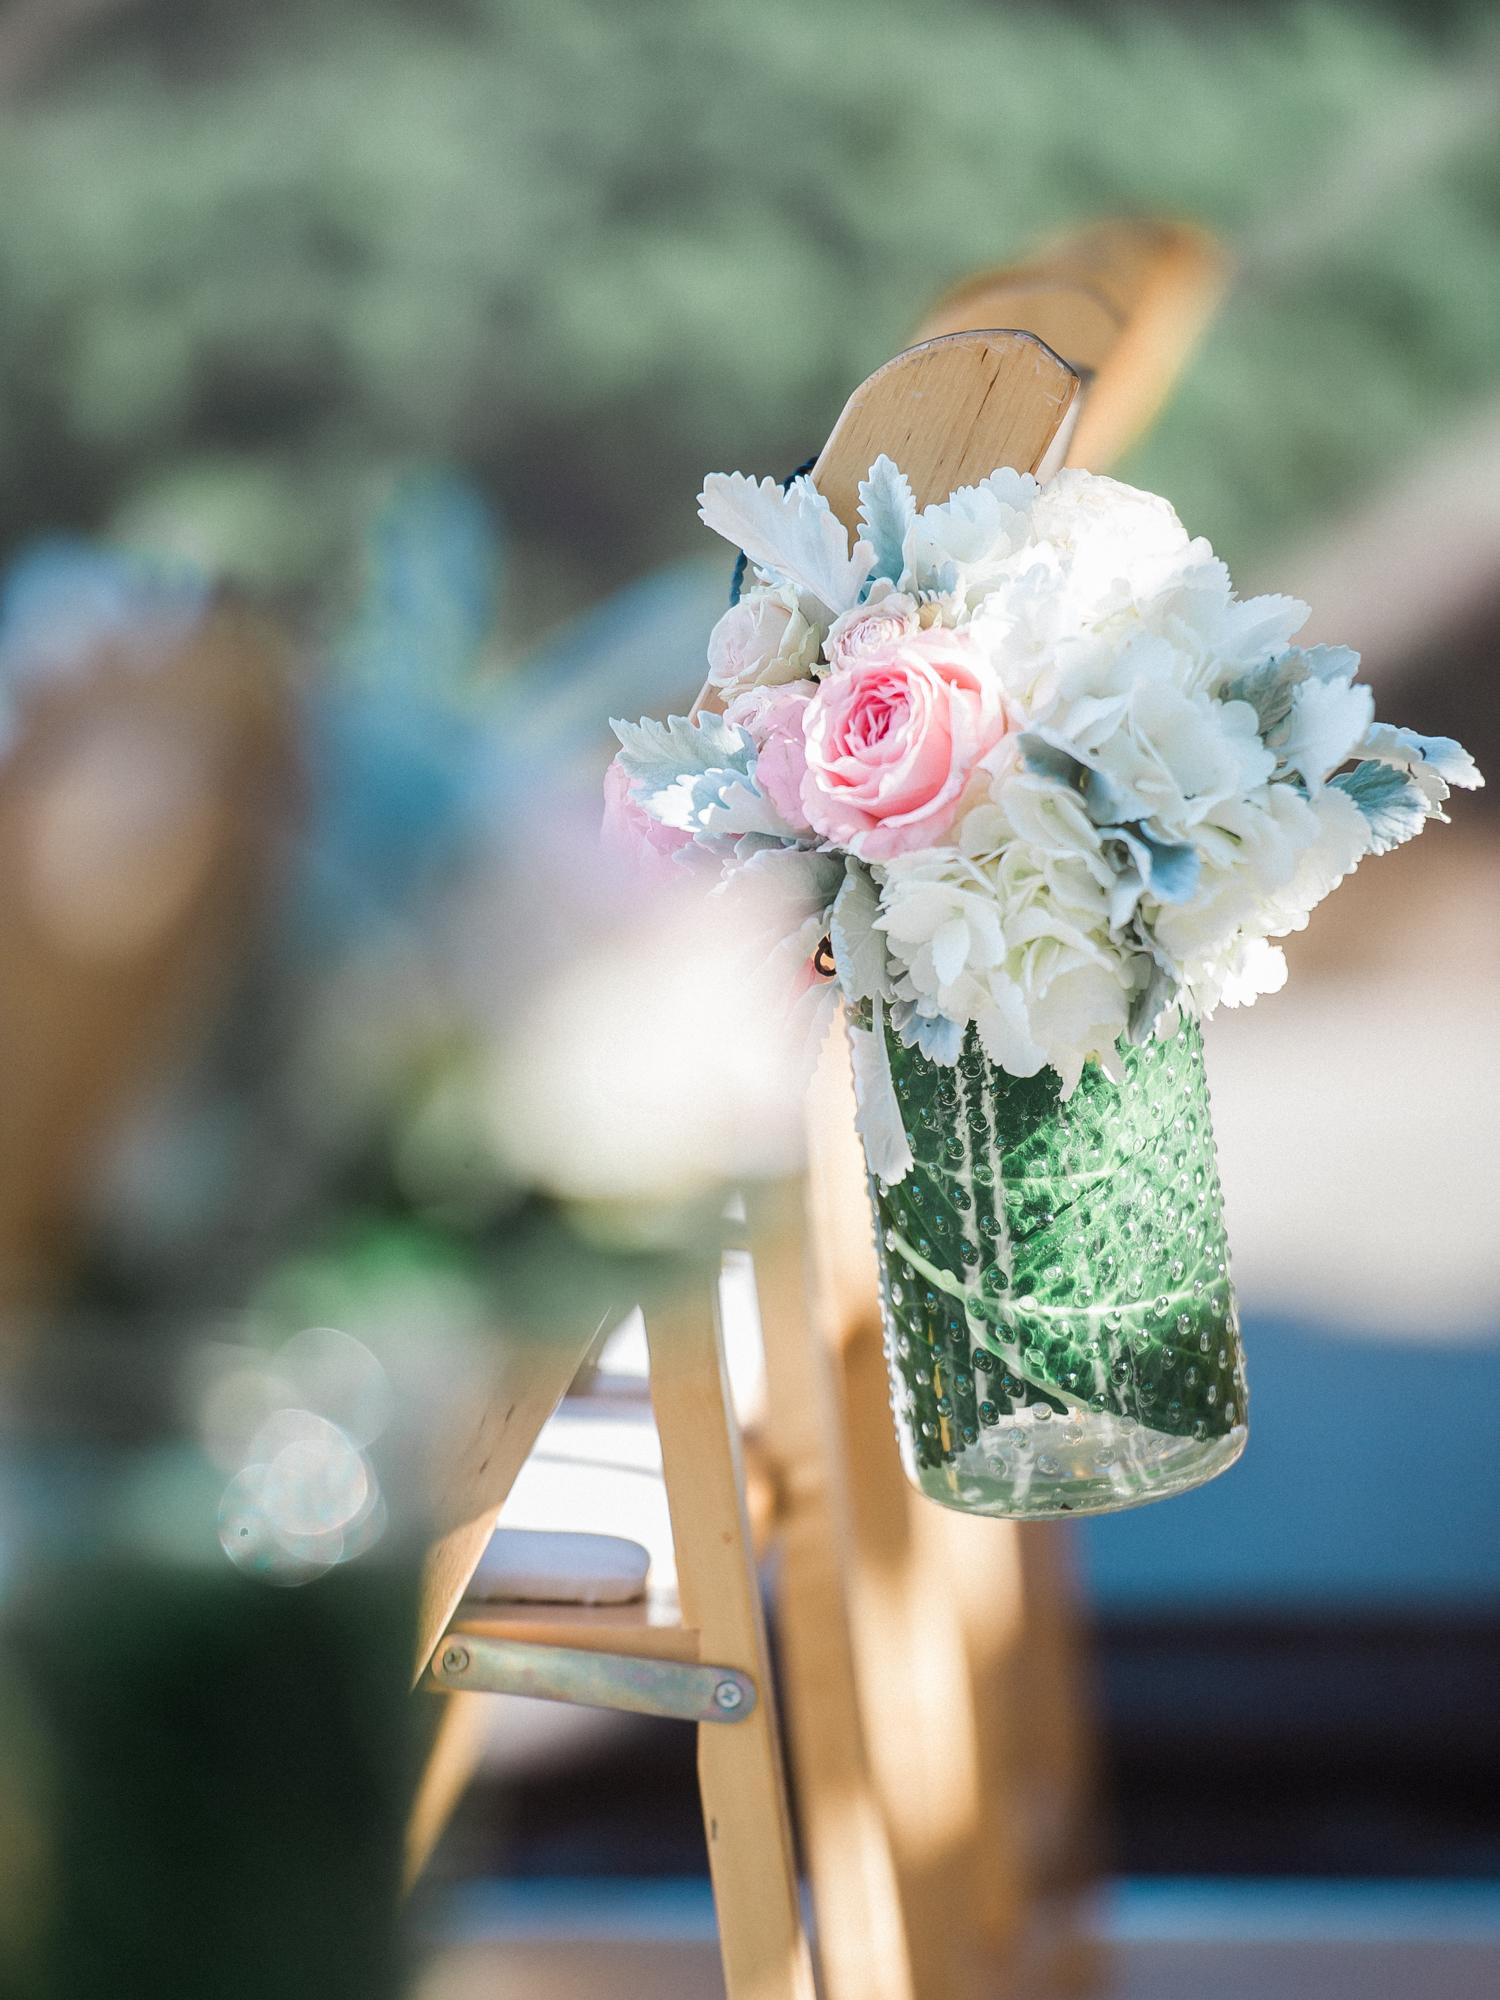 Aimee+Logan_wedding_spp-81.jpg